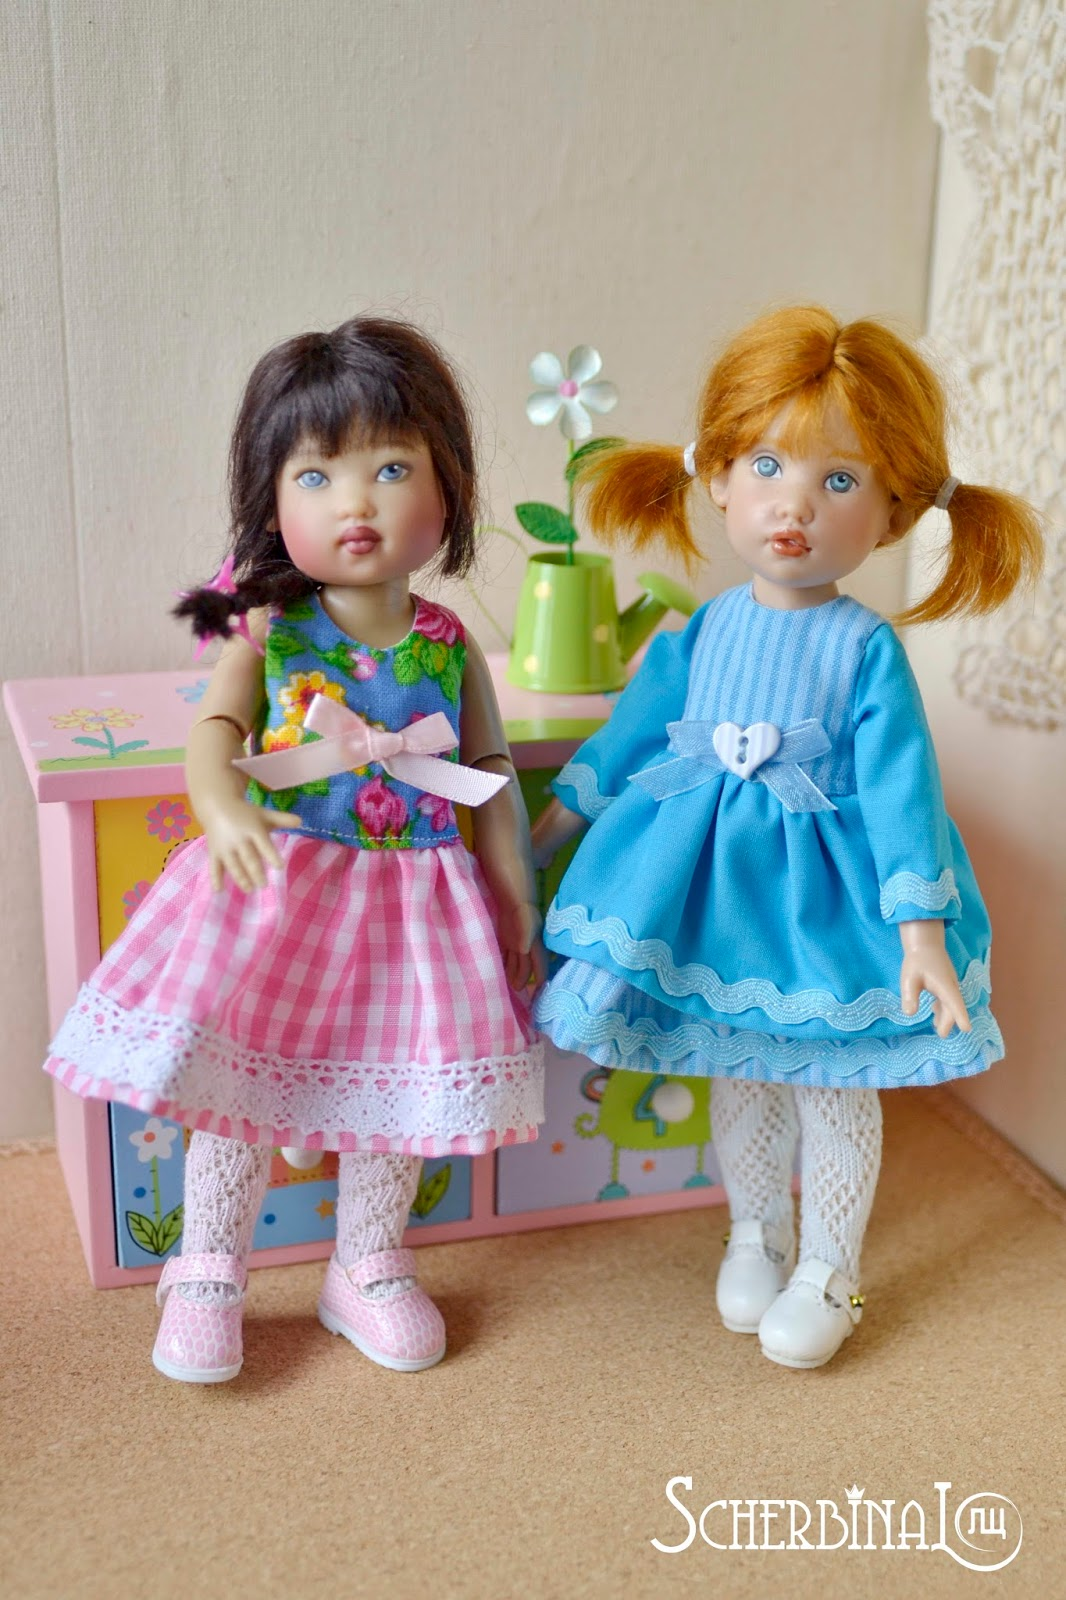 Коллекционные куклы Helen Kish: Tulah, Zsu Zse